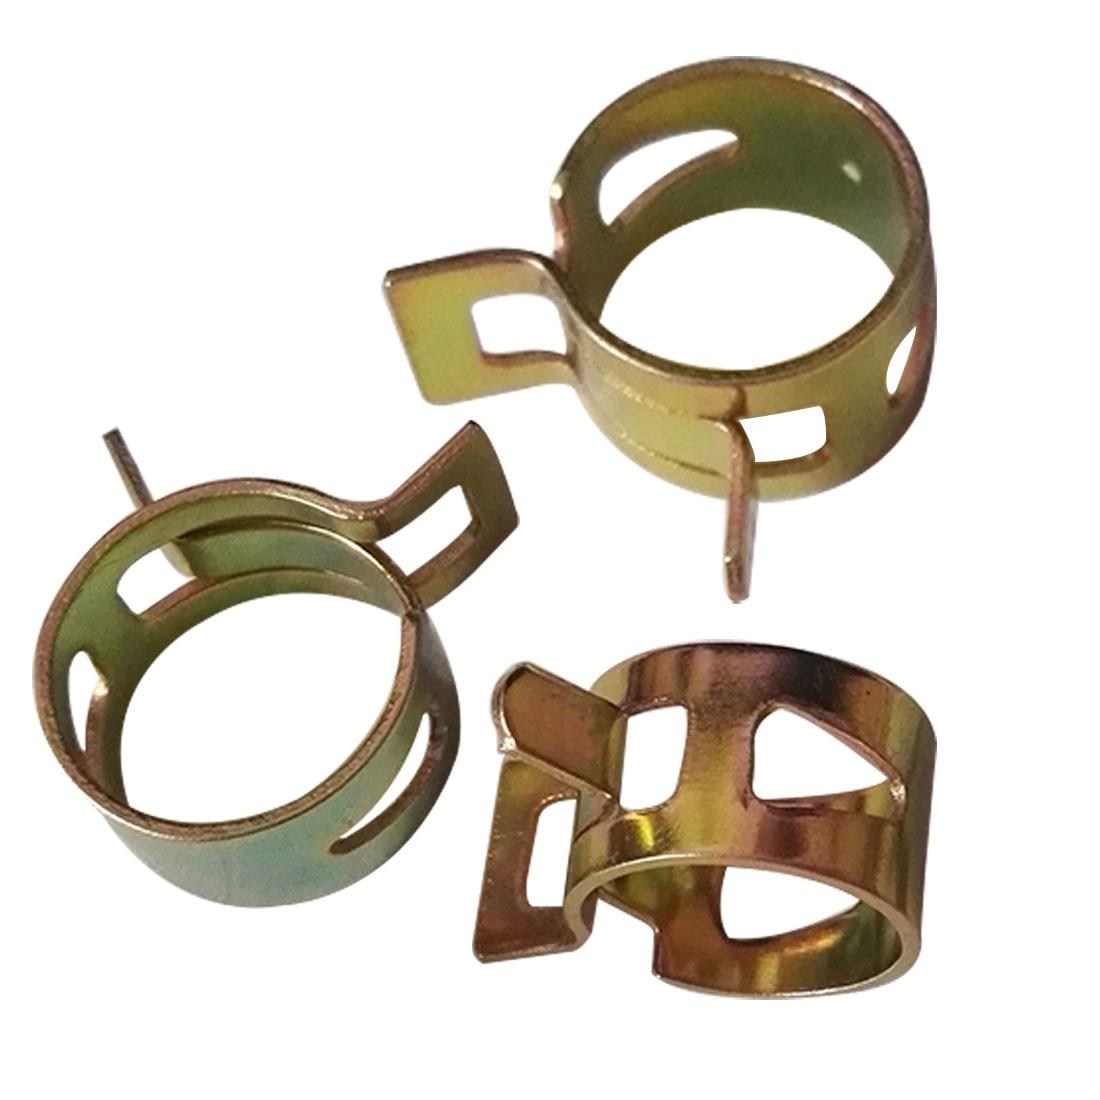 Vacuum line clamps uline tool box